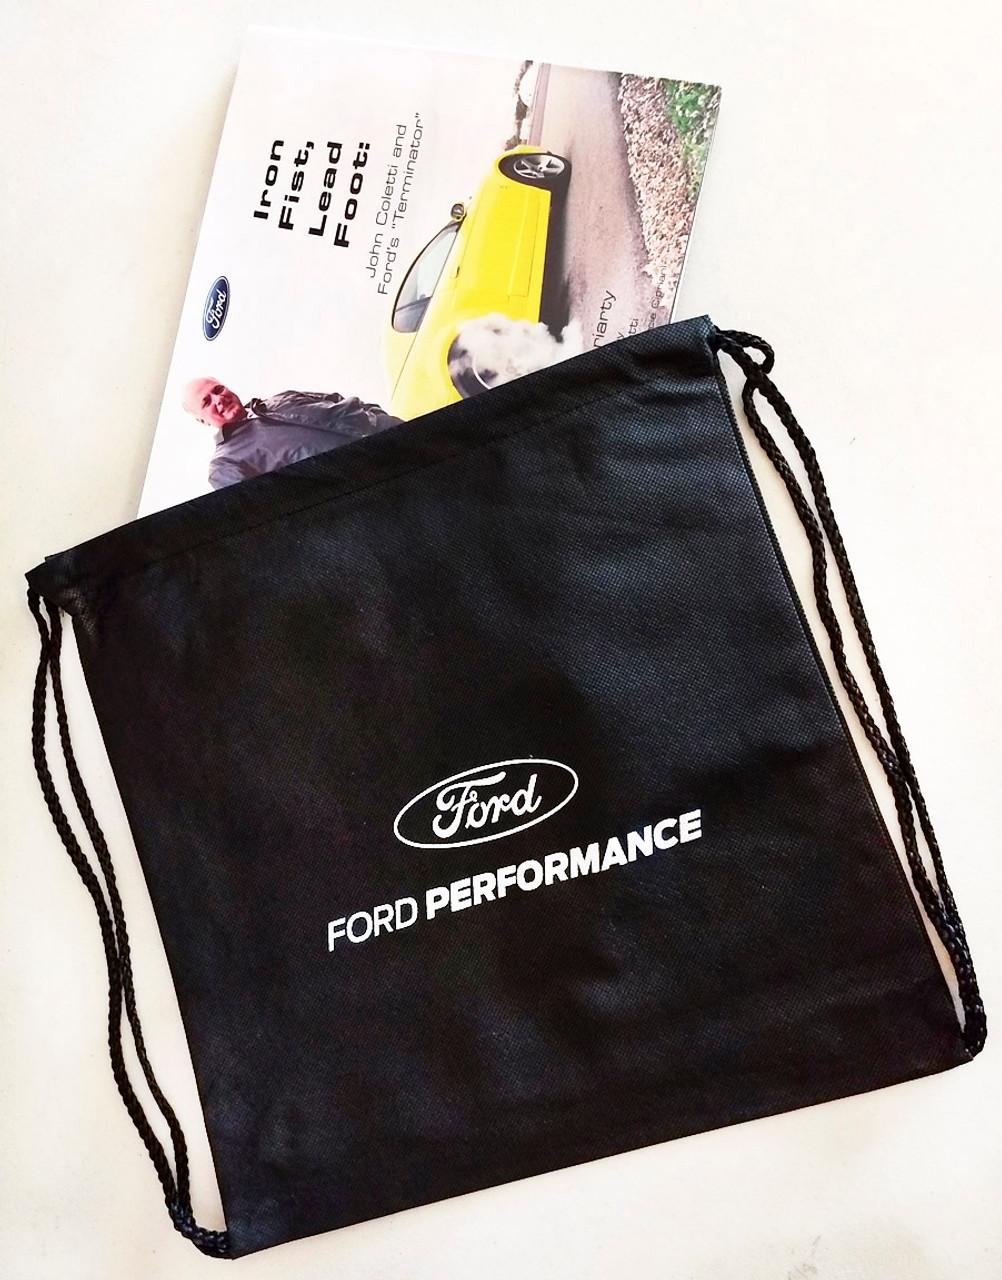 Ford Performance Drawstring Bag